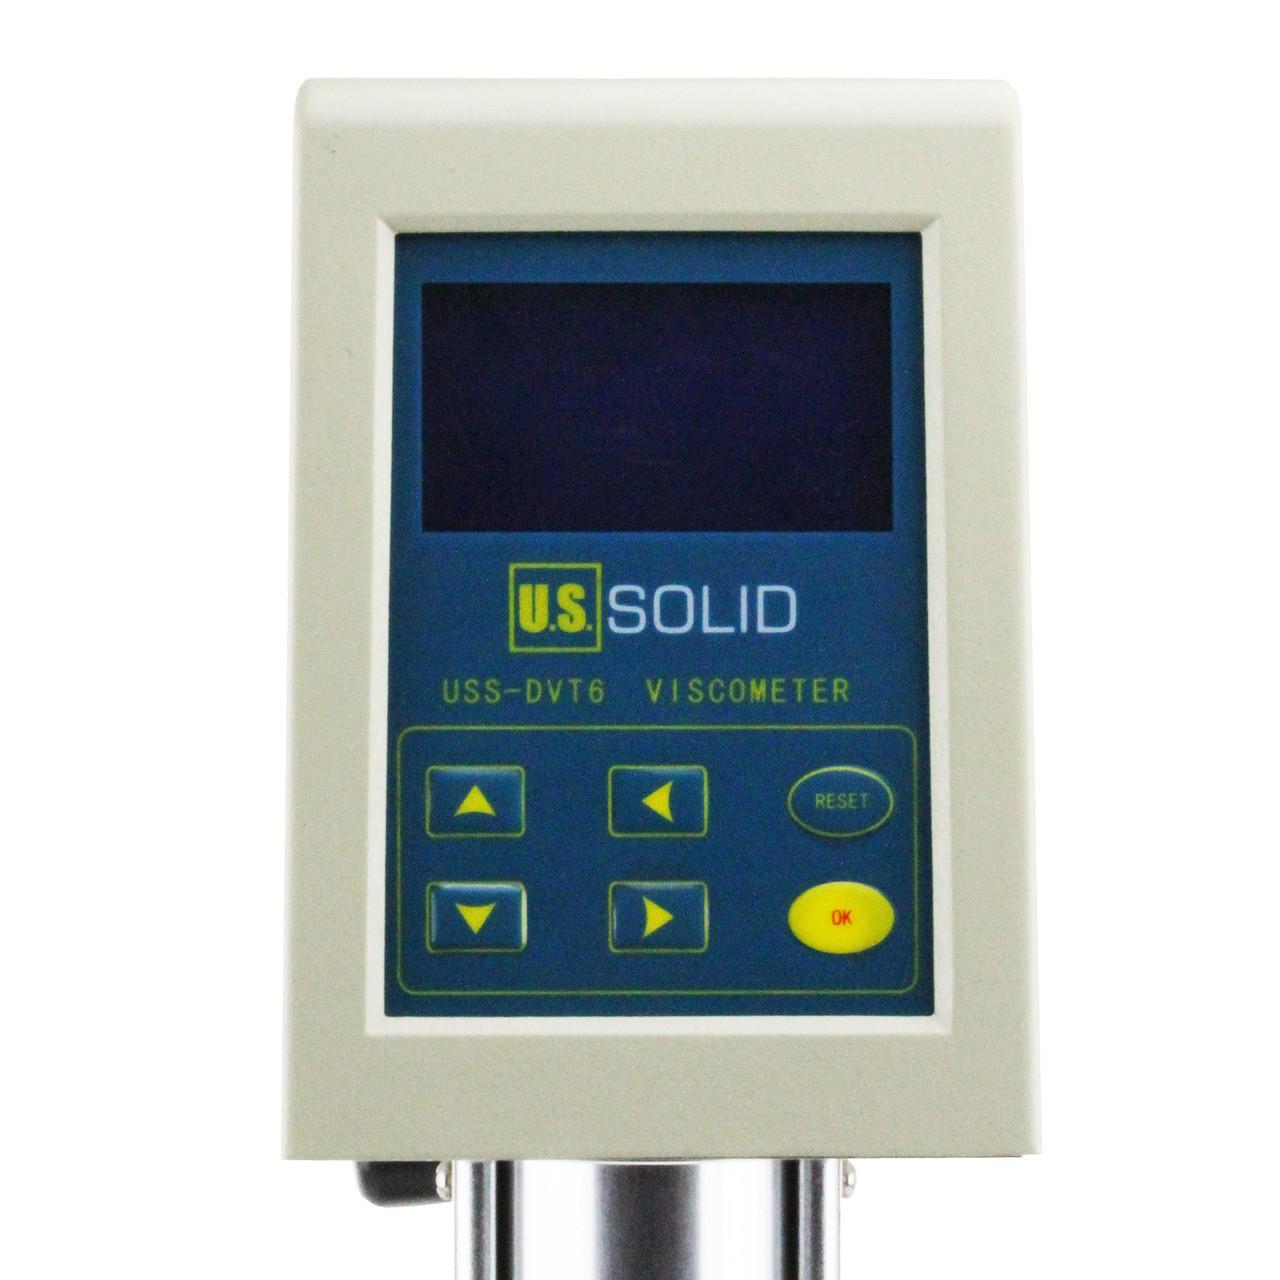 U.S. Solid Rotary Viscometer Viscosity Meter w/ LCD Temperature Display 1-1×100000 mPa·s